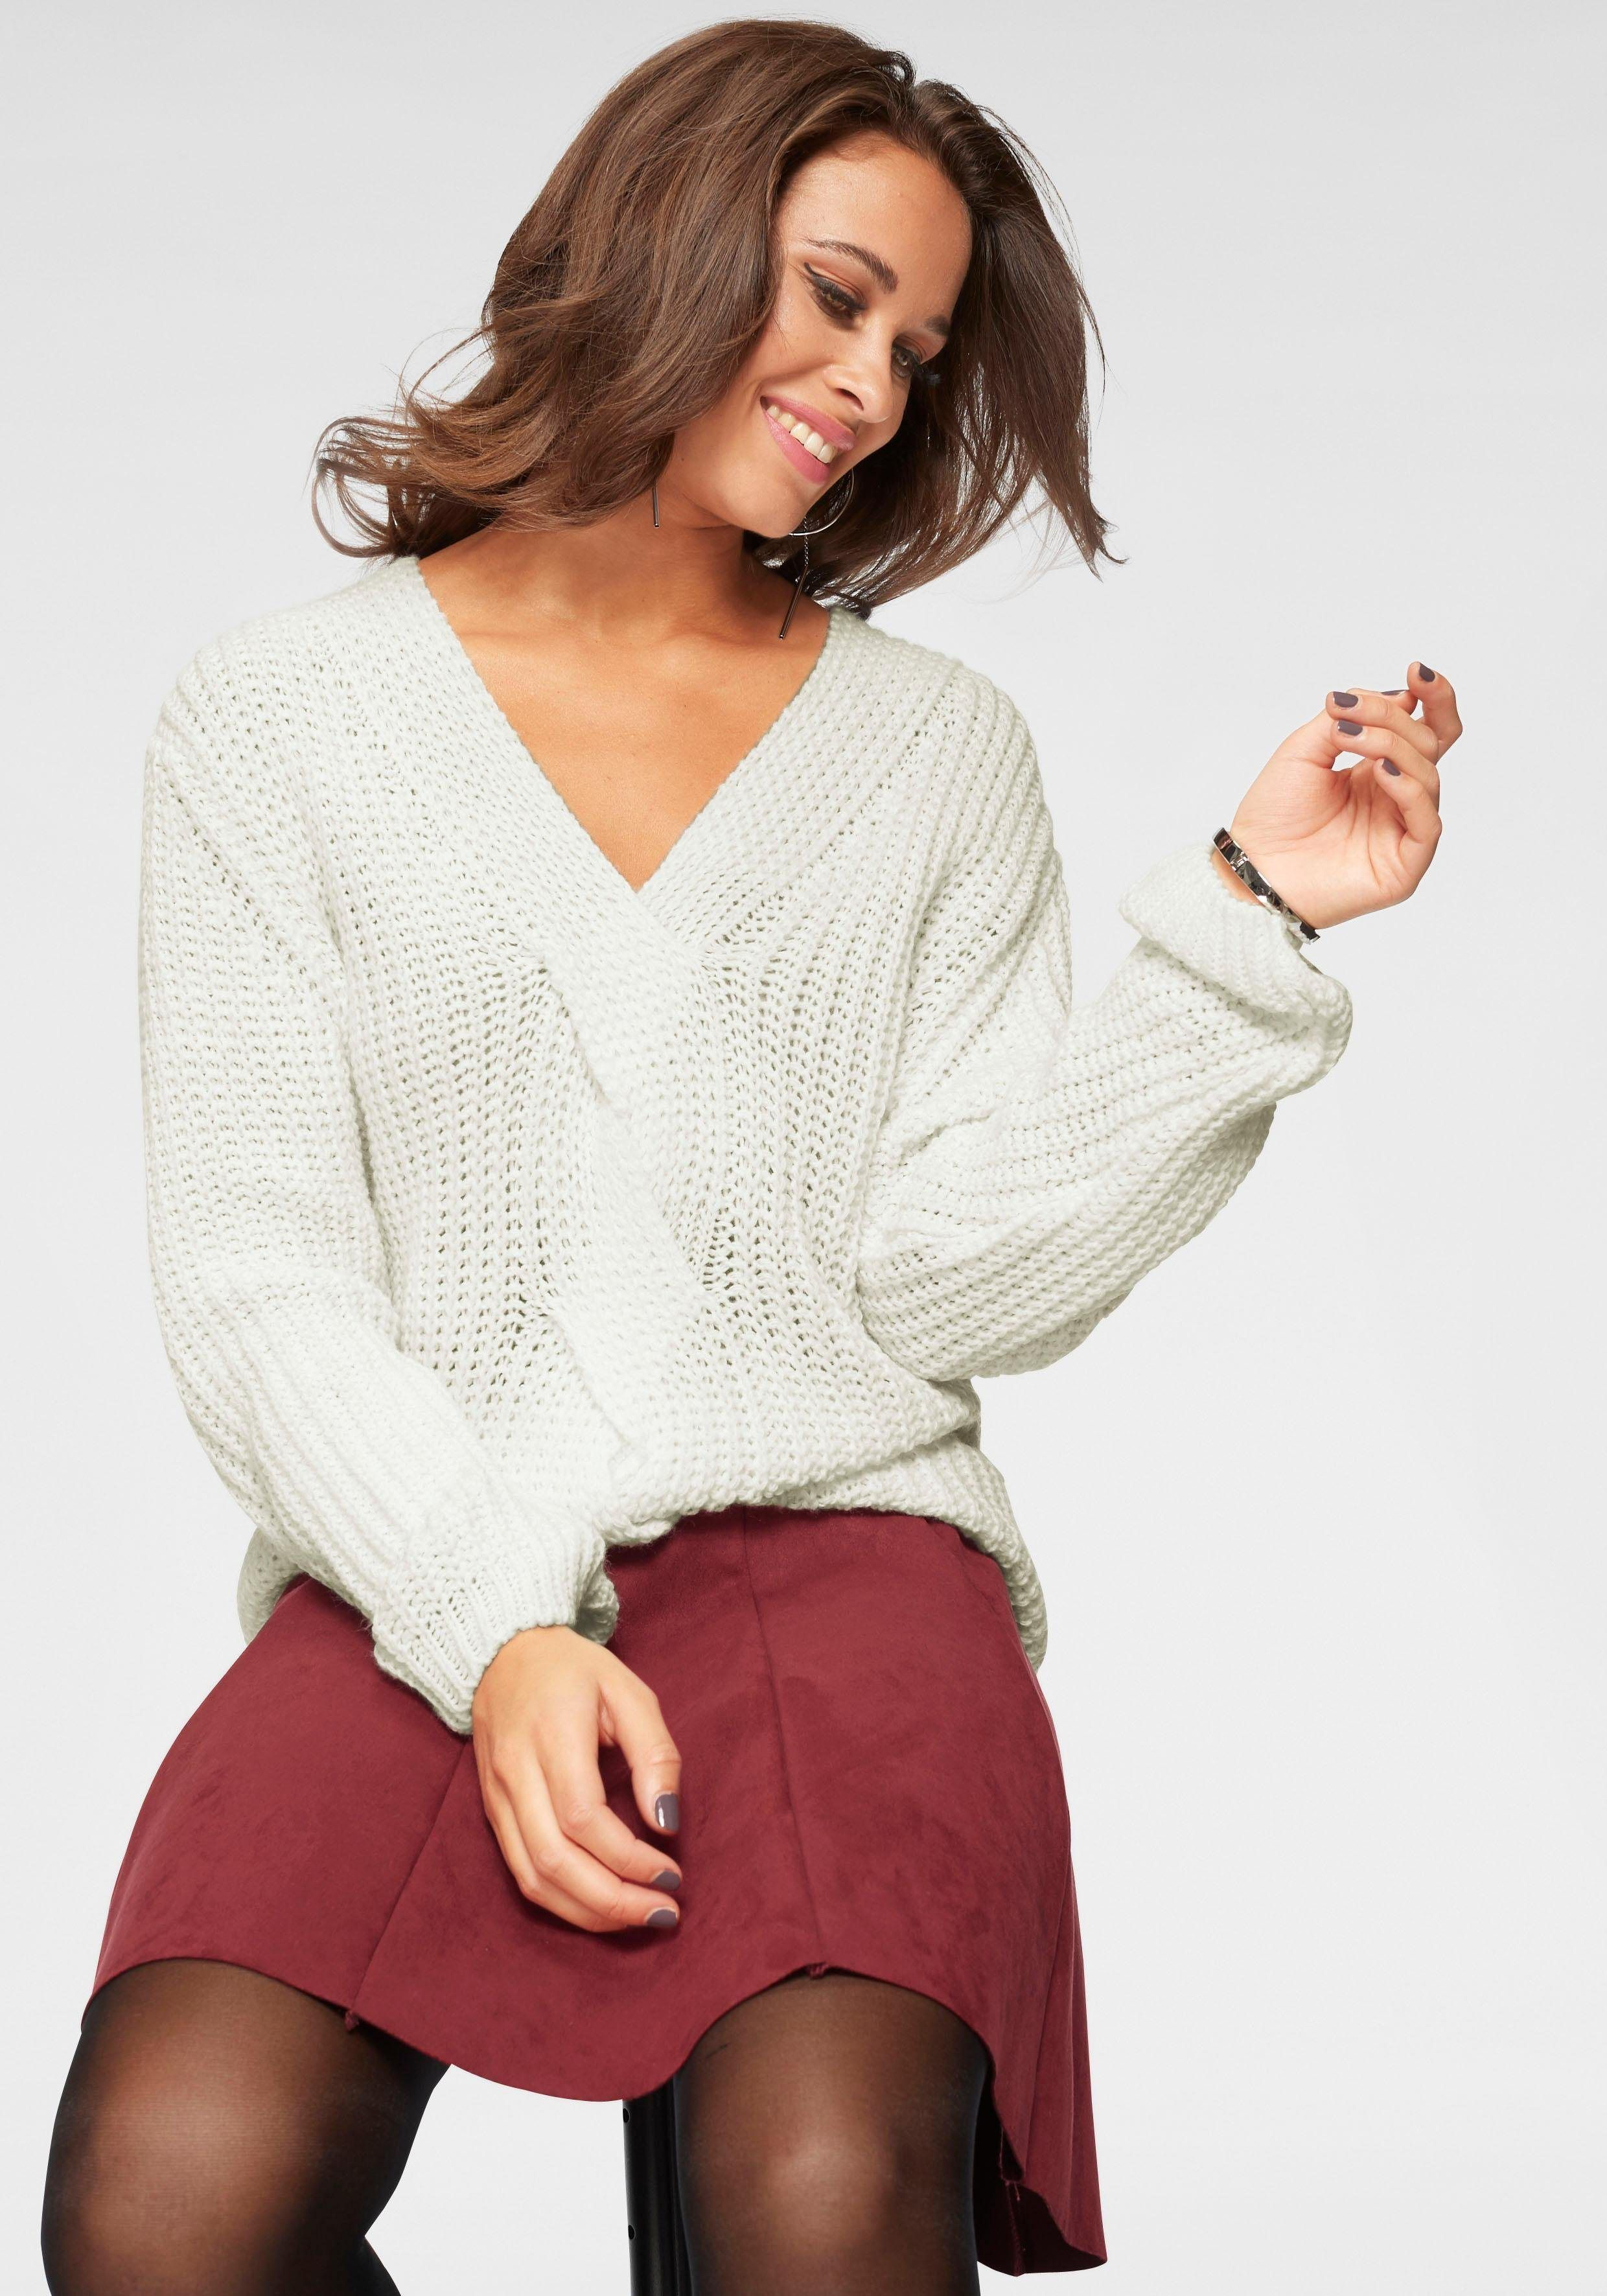 OTTO  Bekleidung  Pullover  V Ausschnitt Pullover  Damen  HaILY S   VAusschnittPullover b0341de795